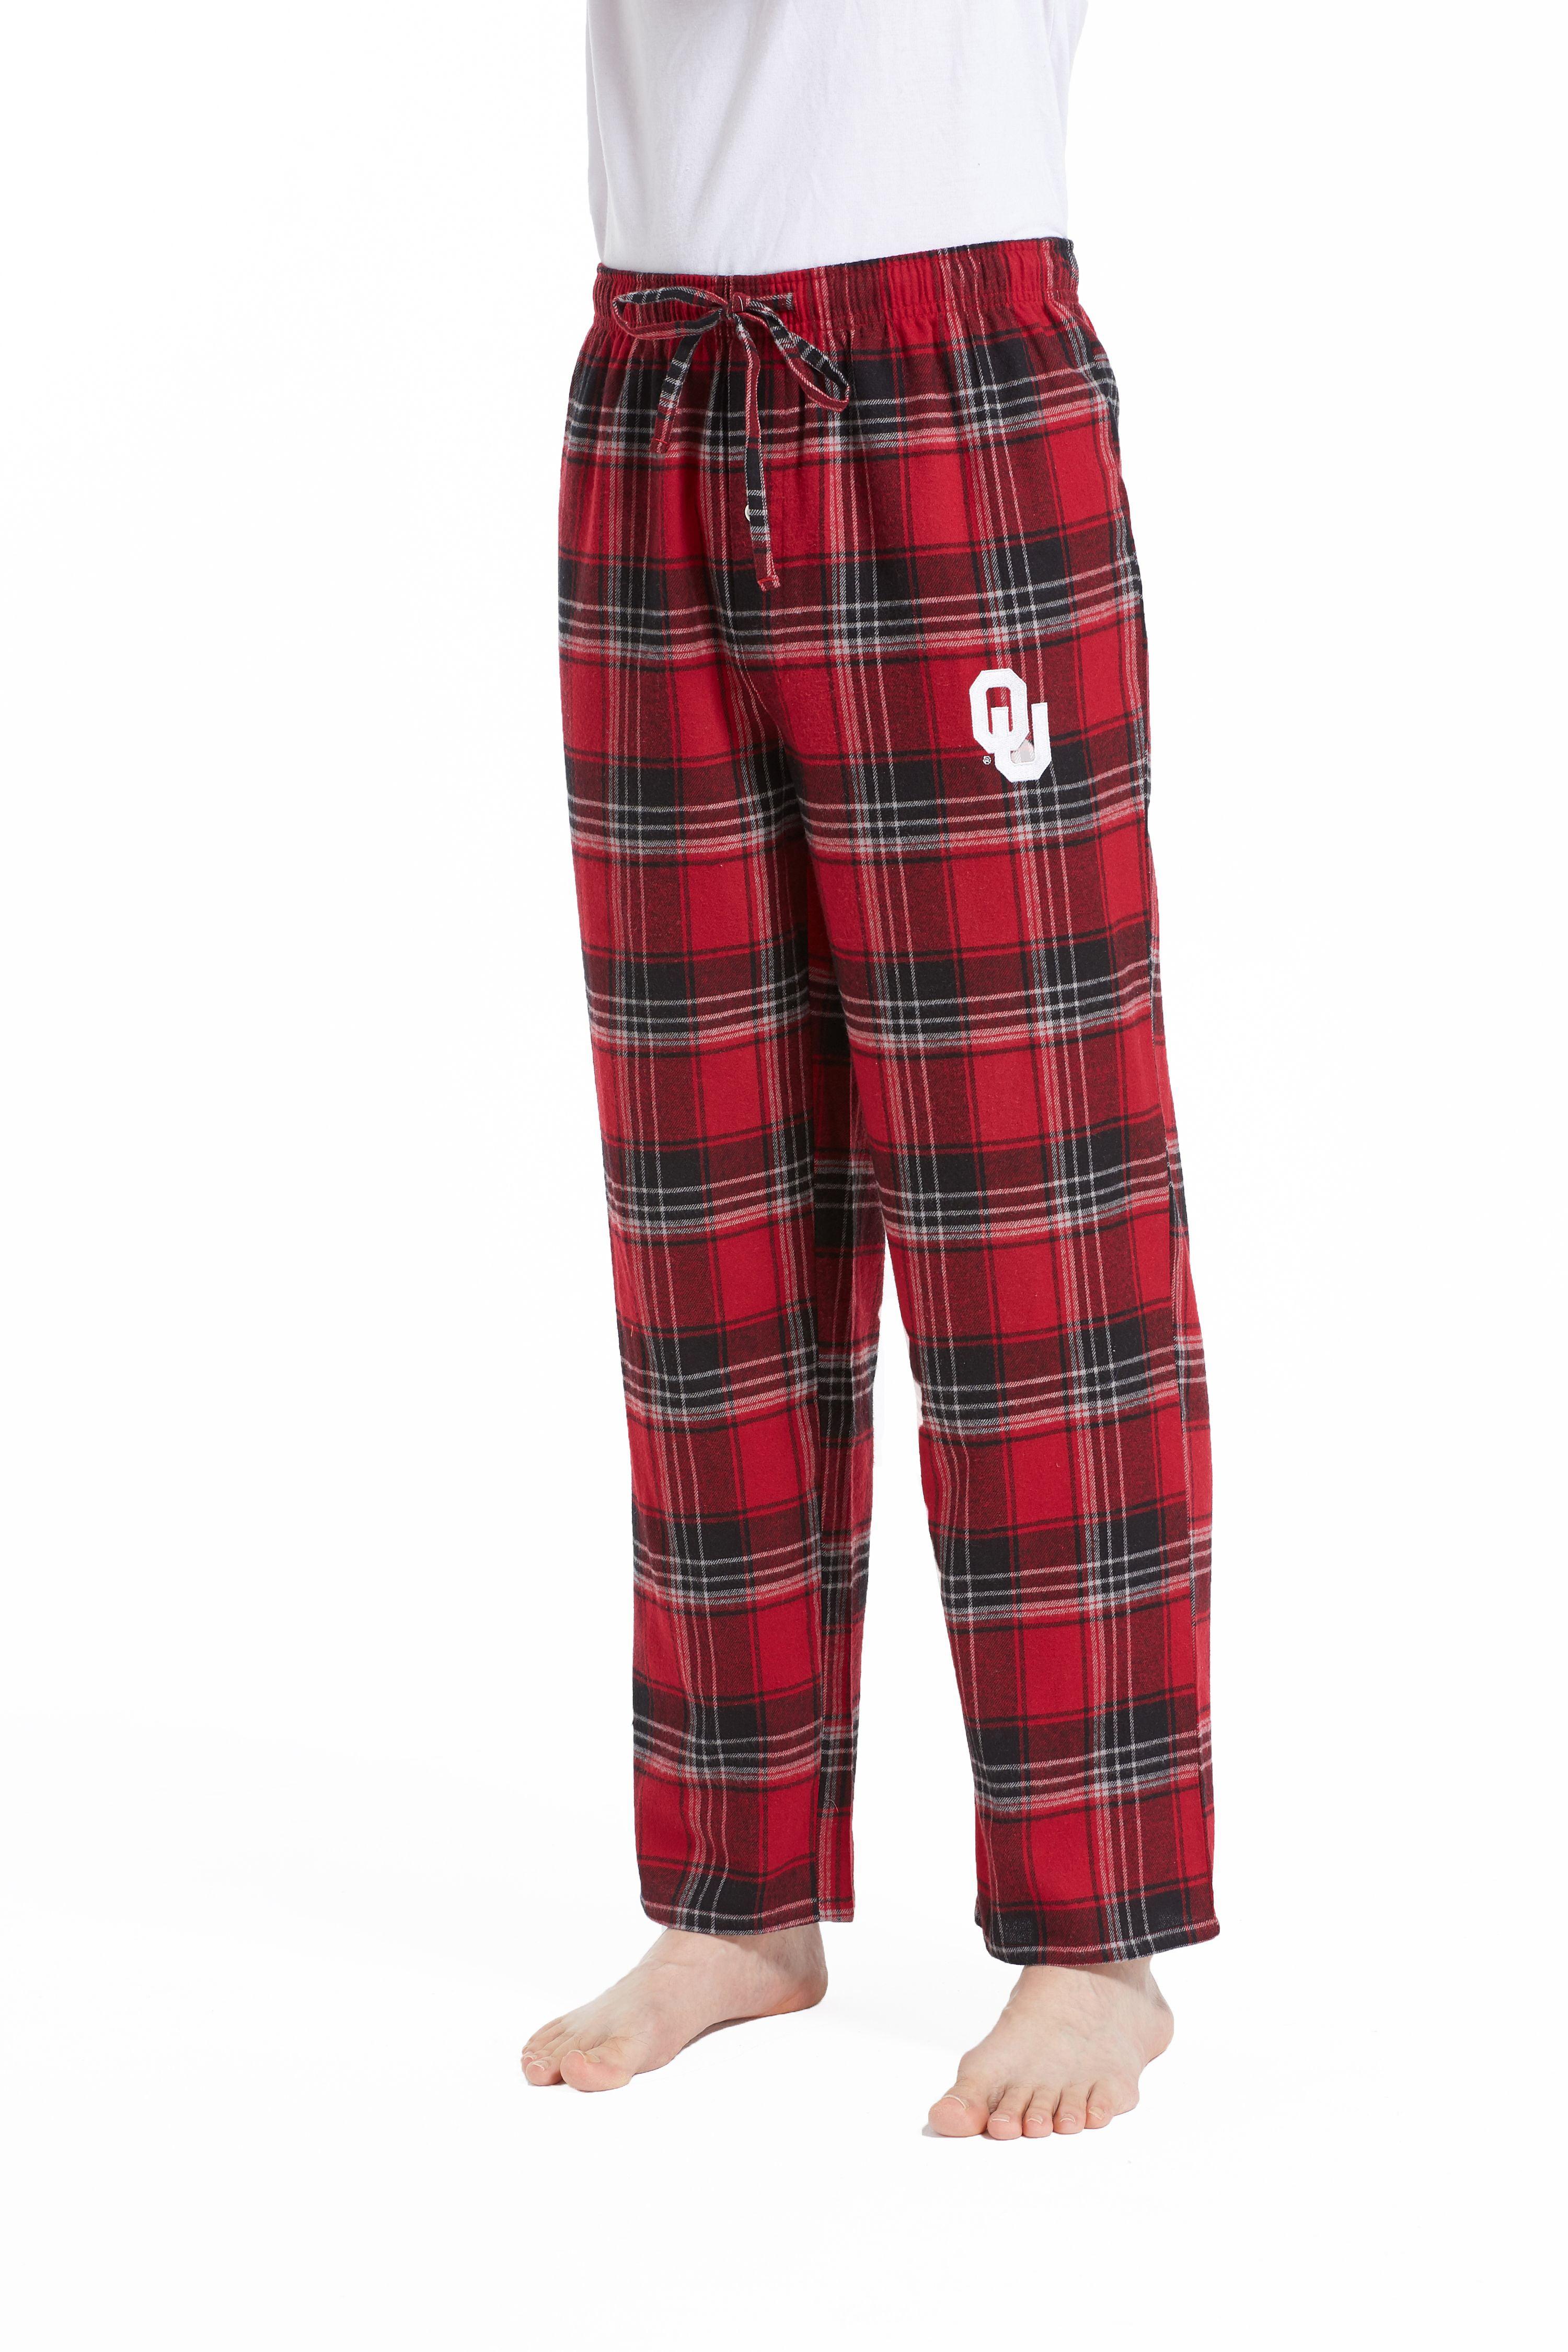 NCAA Oklahoma Sooners Groundbreaker Men's Flannel Pant